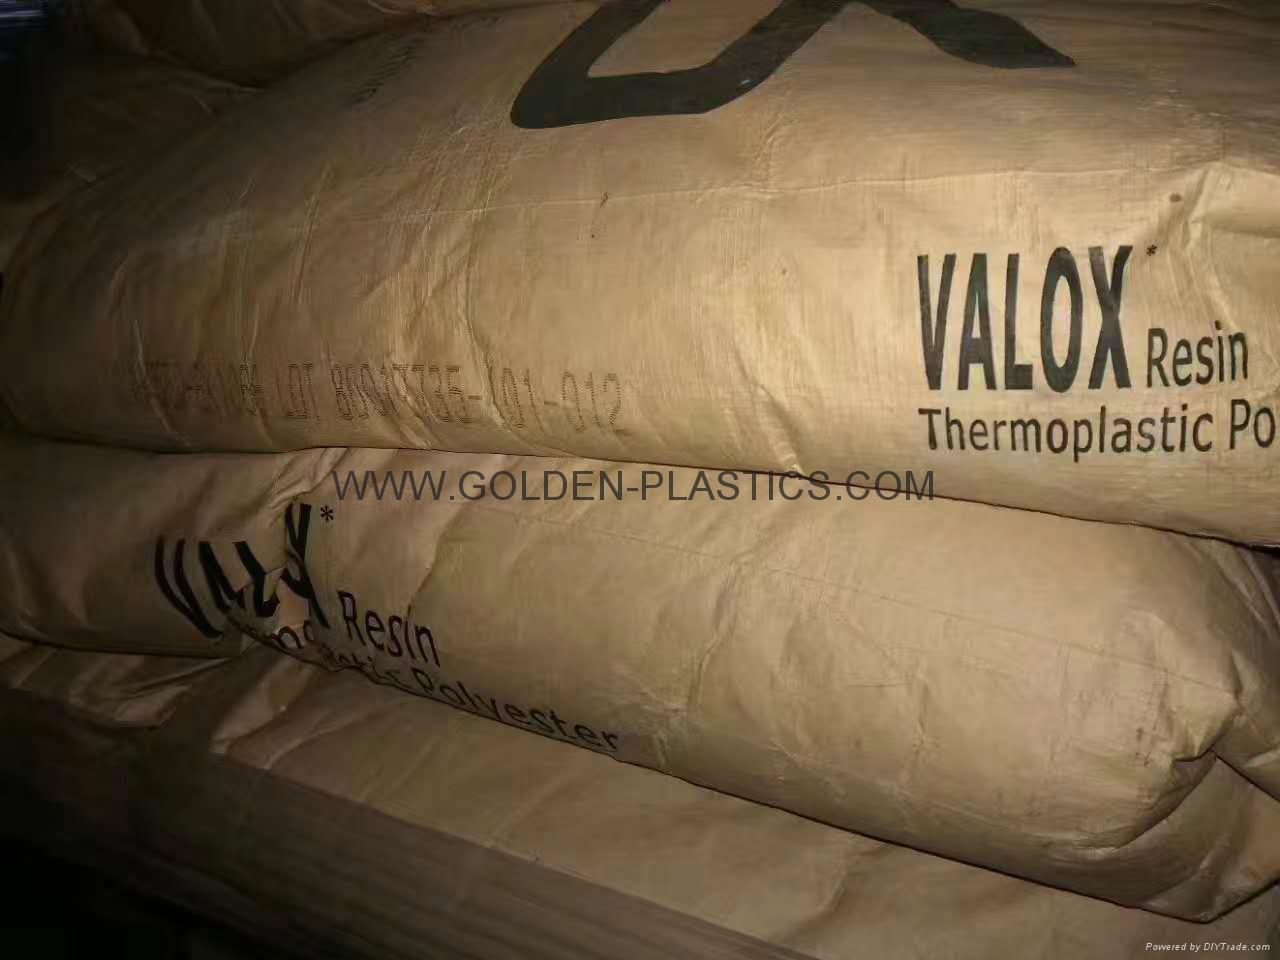 Valox iQ™ PBT resin EPEAT